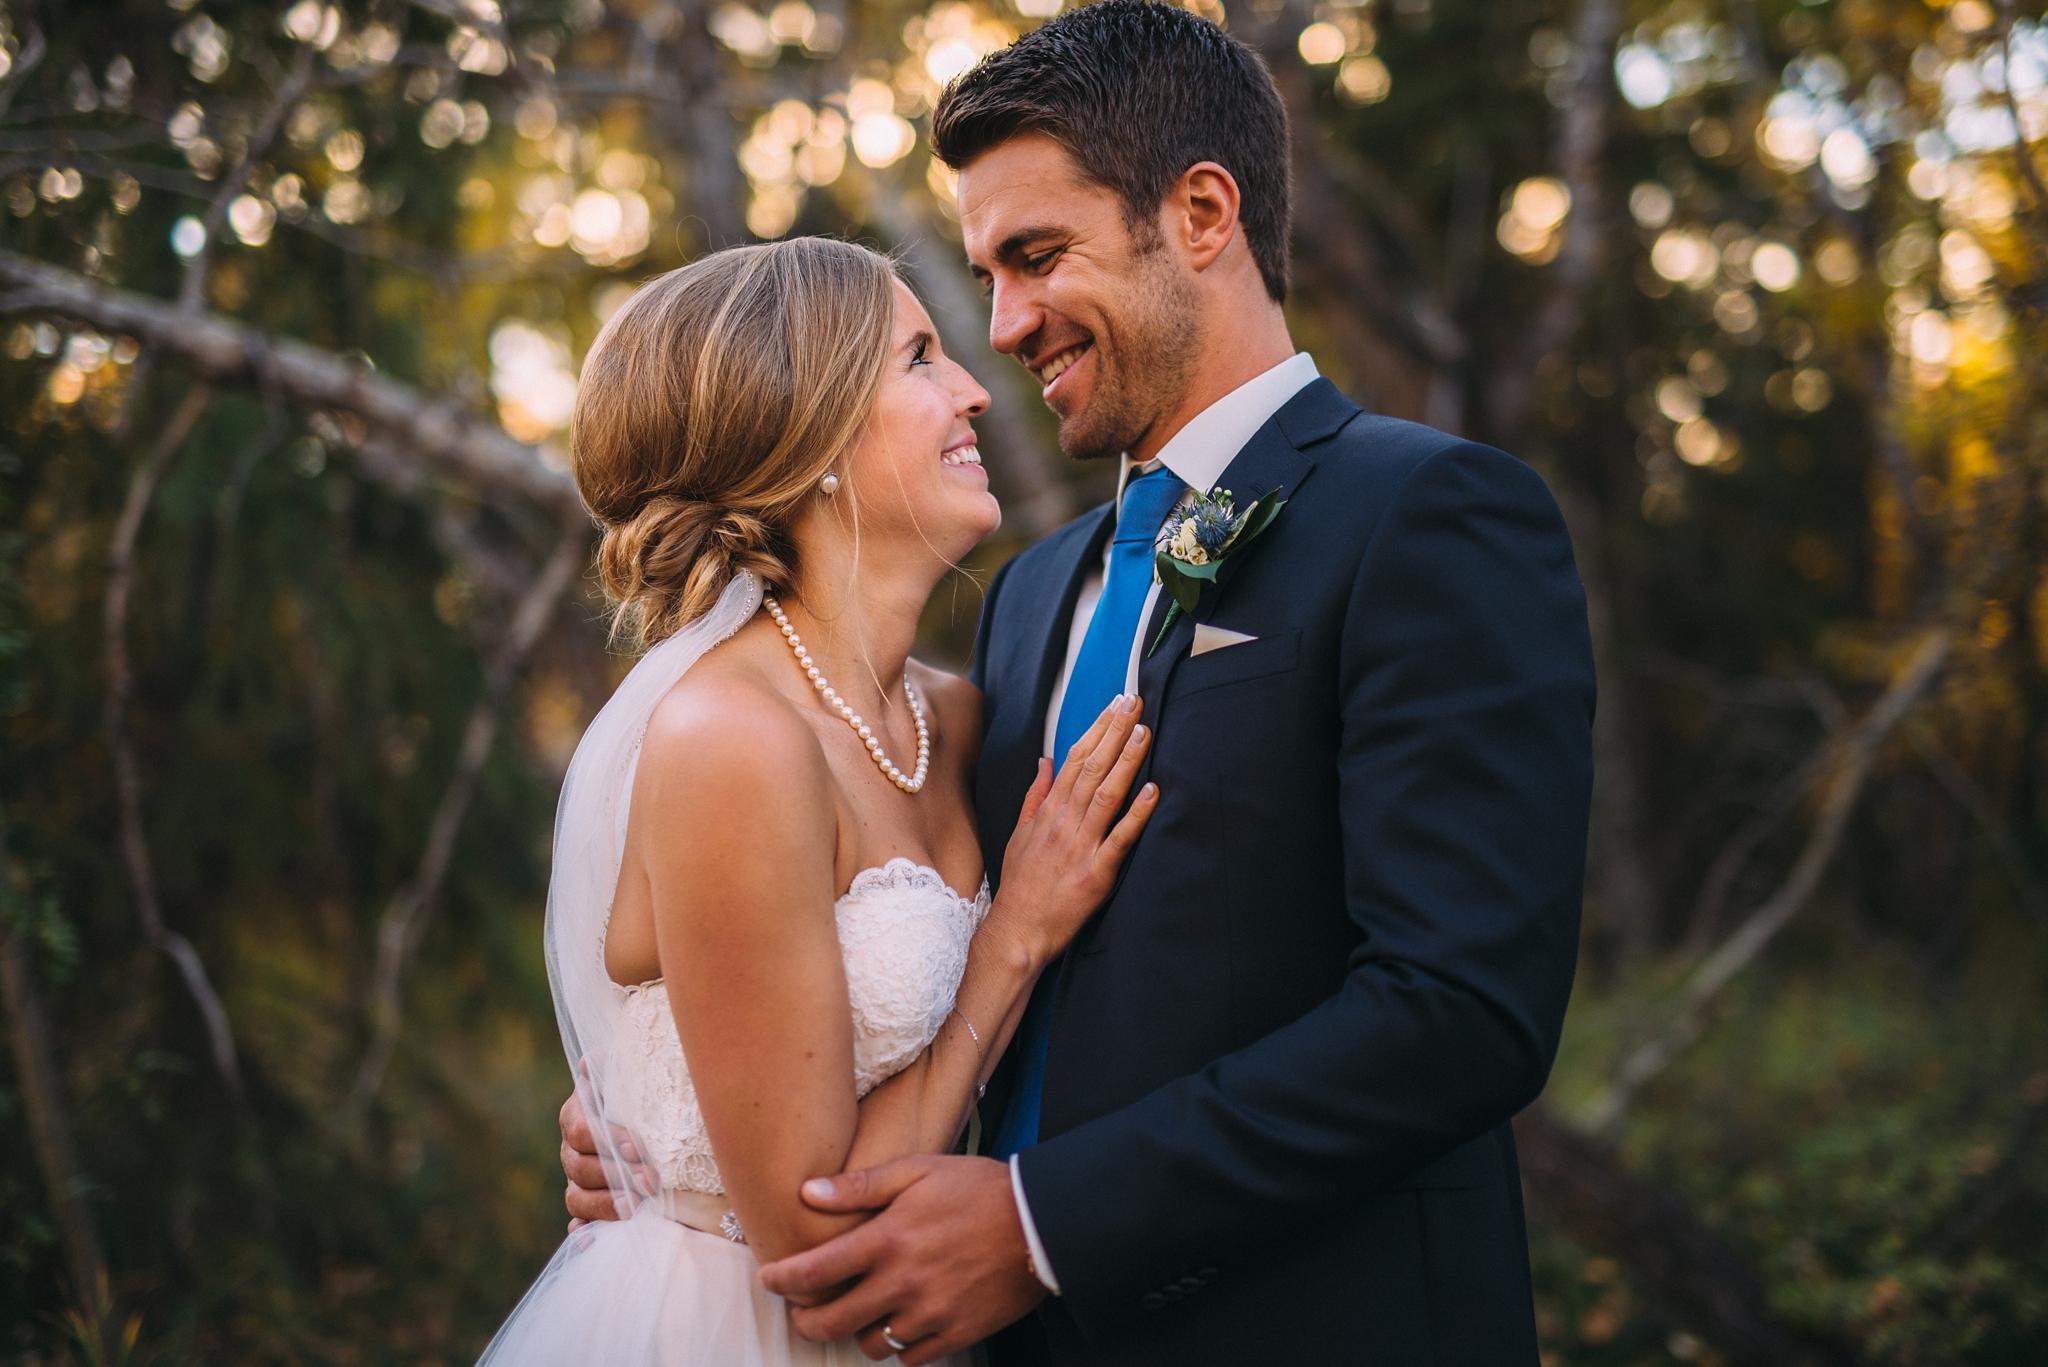 kaihla_tonai_intimate_wedding_elopement_photographer_2902